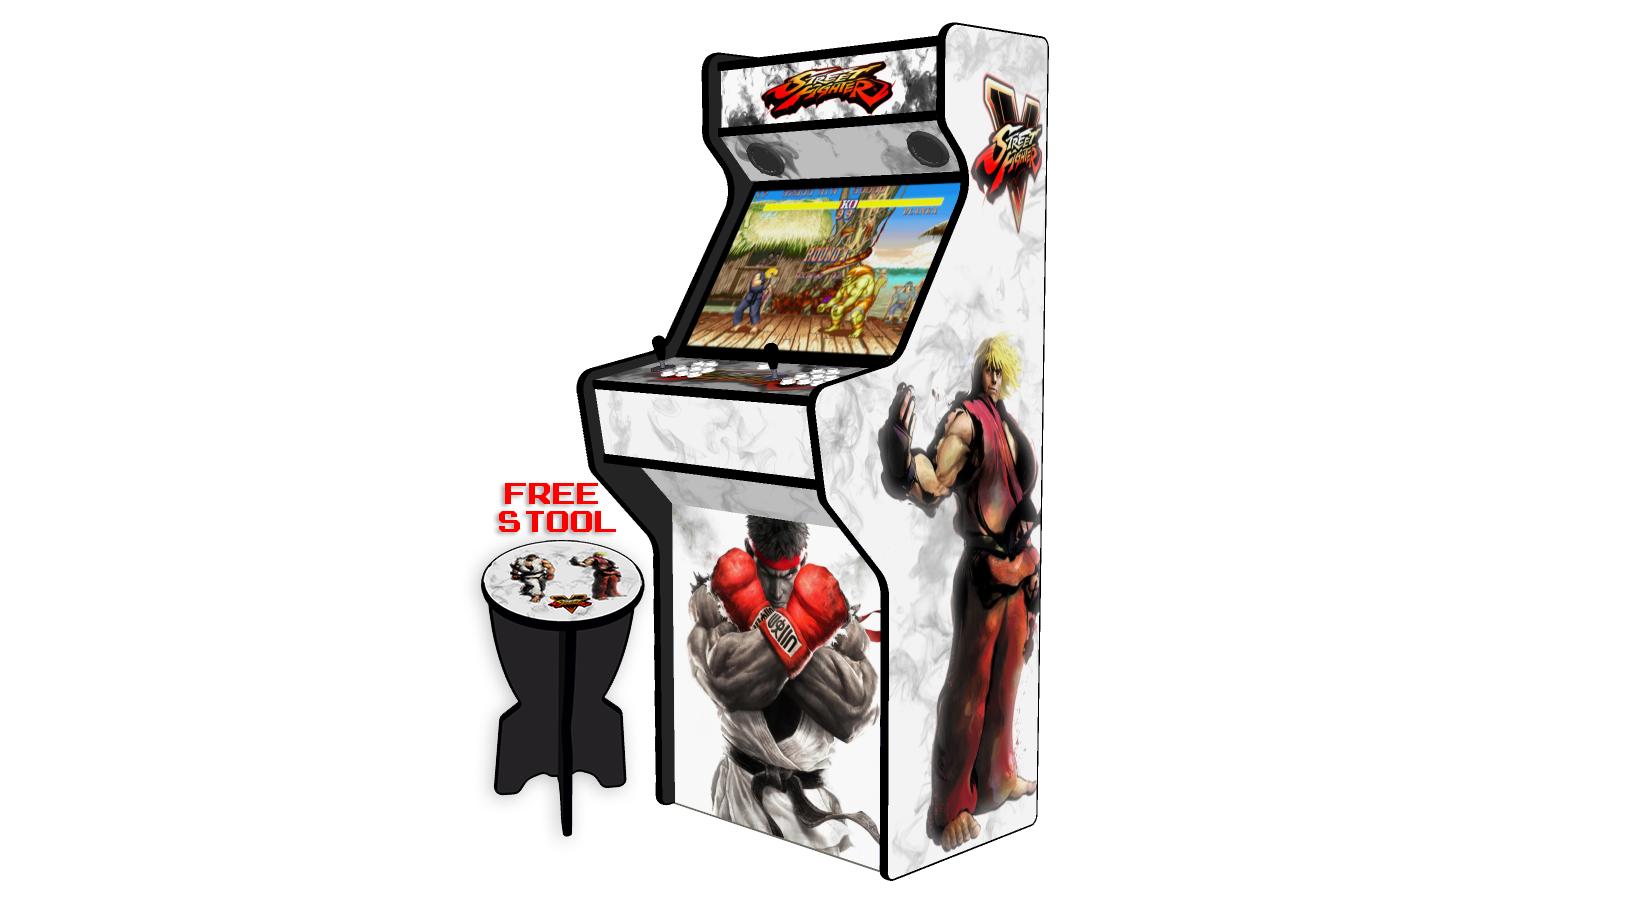 Street Fighter 5 White - 27 Inch Upright Arcade Machine - American Style Joysticks - Black Tmold - 5 btns - right